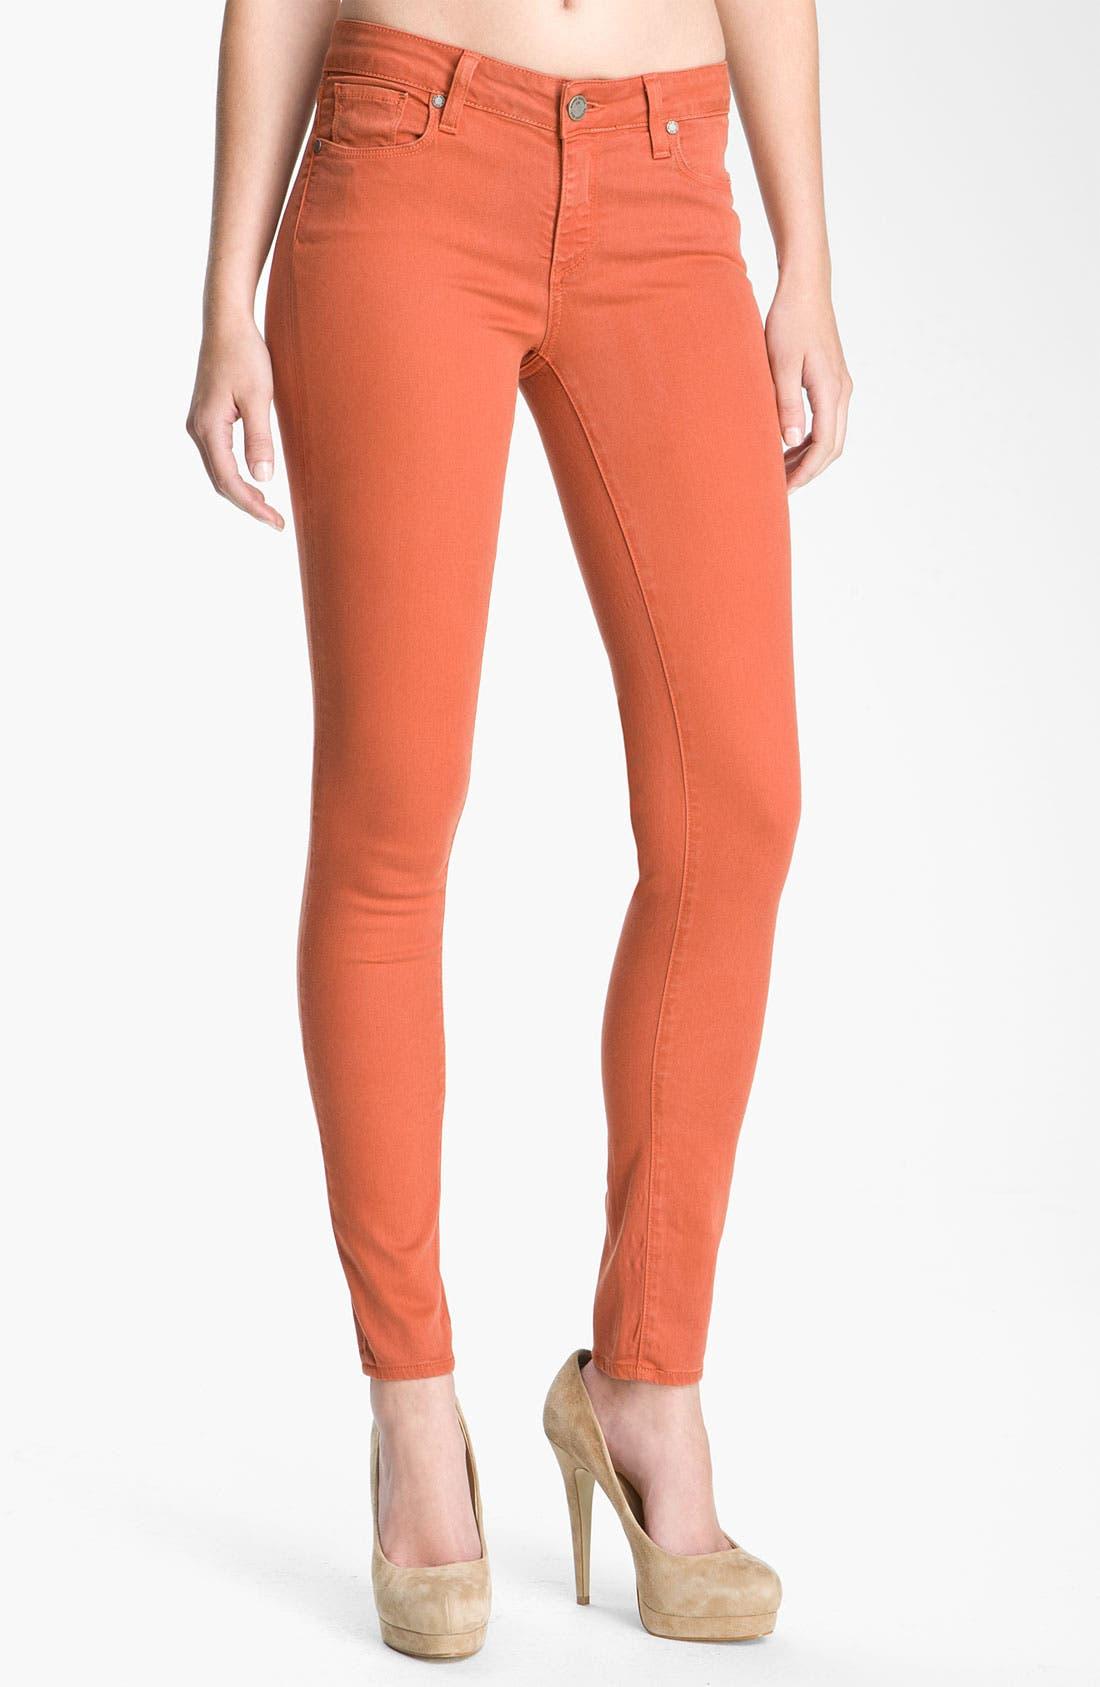 Alternate Image 1 Selected - Paige Denim 'Verdugo' Skinny Stretch Jeans (Picasso)